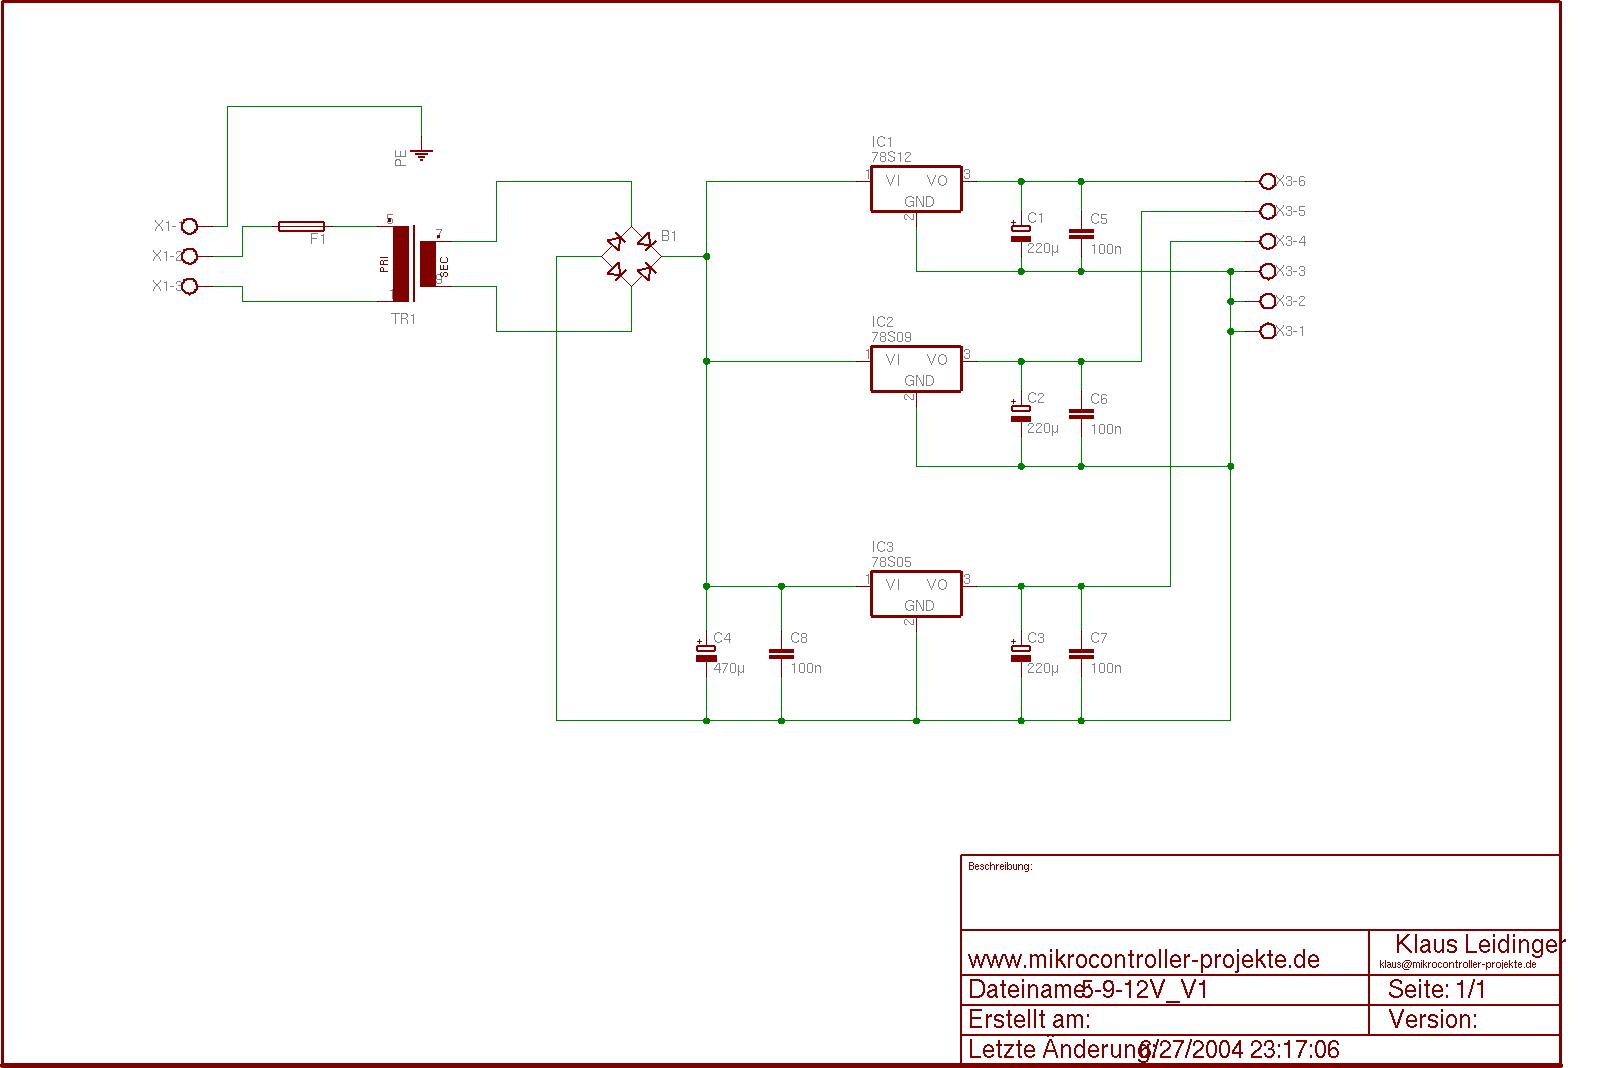 Diagram 71900 edelbrock wiring diagram controller Diagram Schematic on